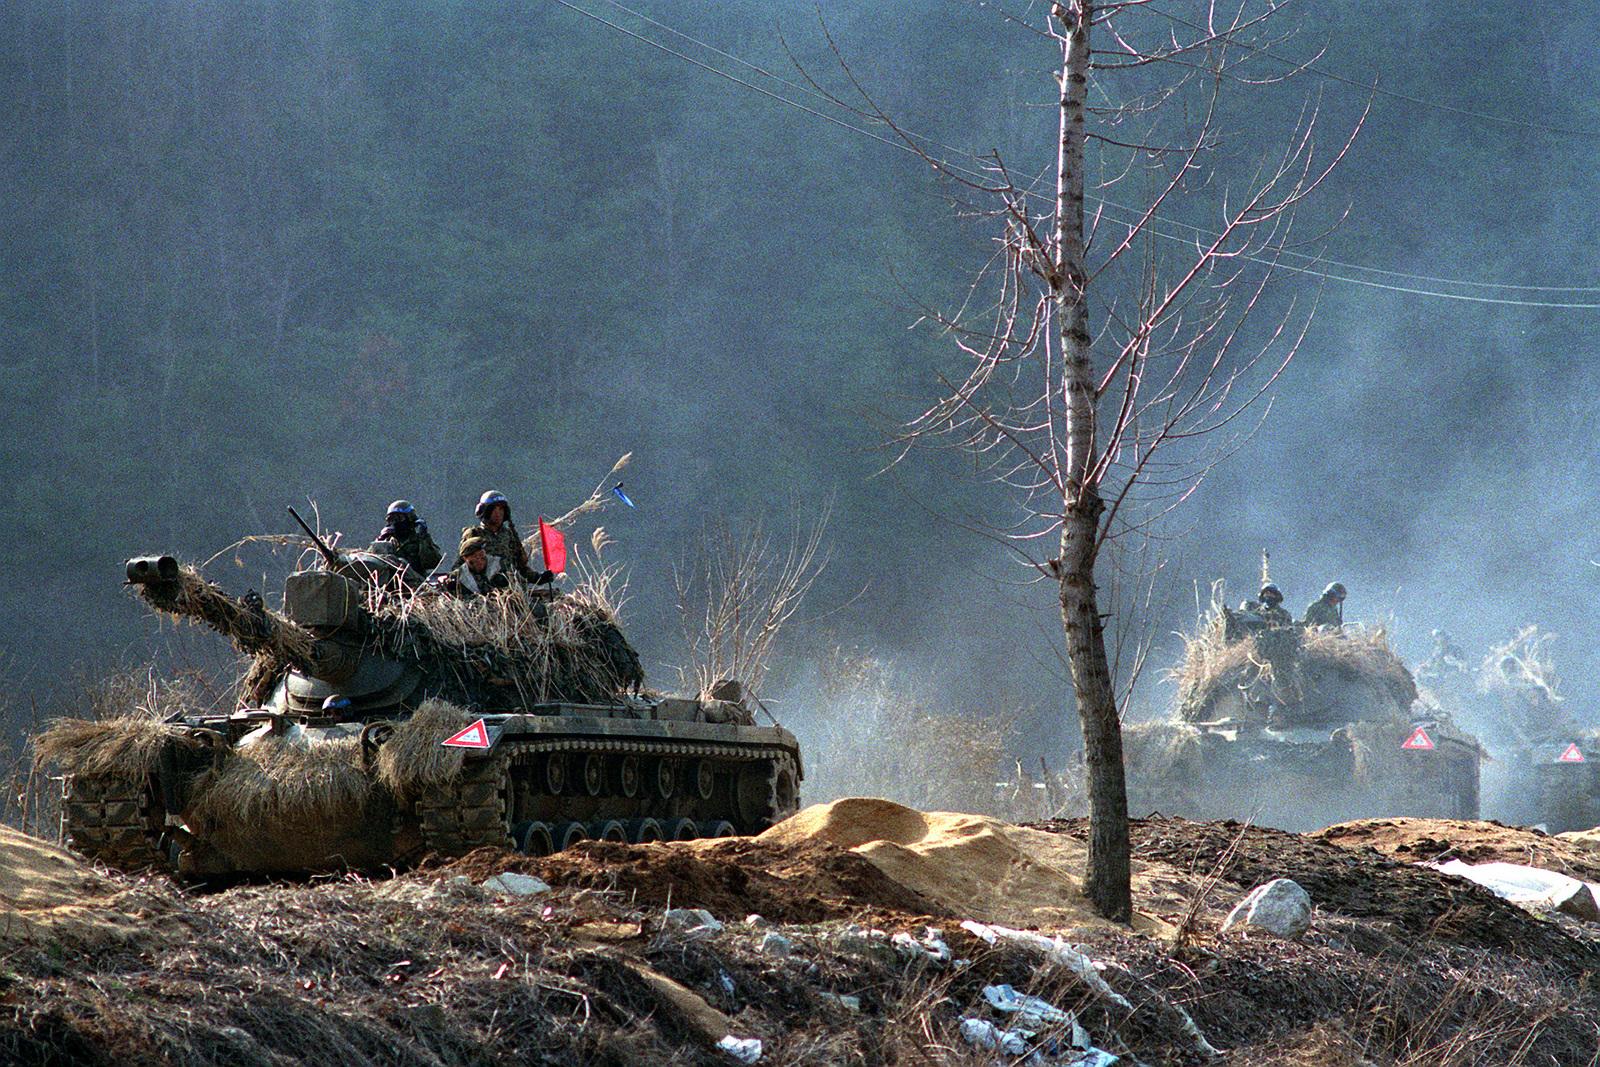 A column of South Korean M-48 main battle tanks advances along a road during the combined South Korean/U.S. exercise Team Spirit '90